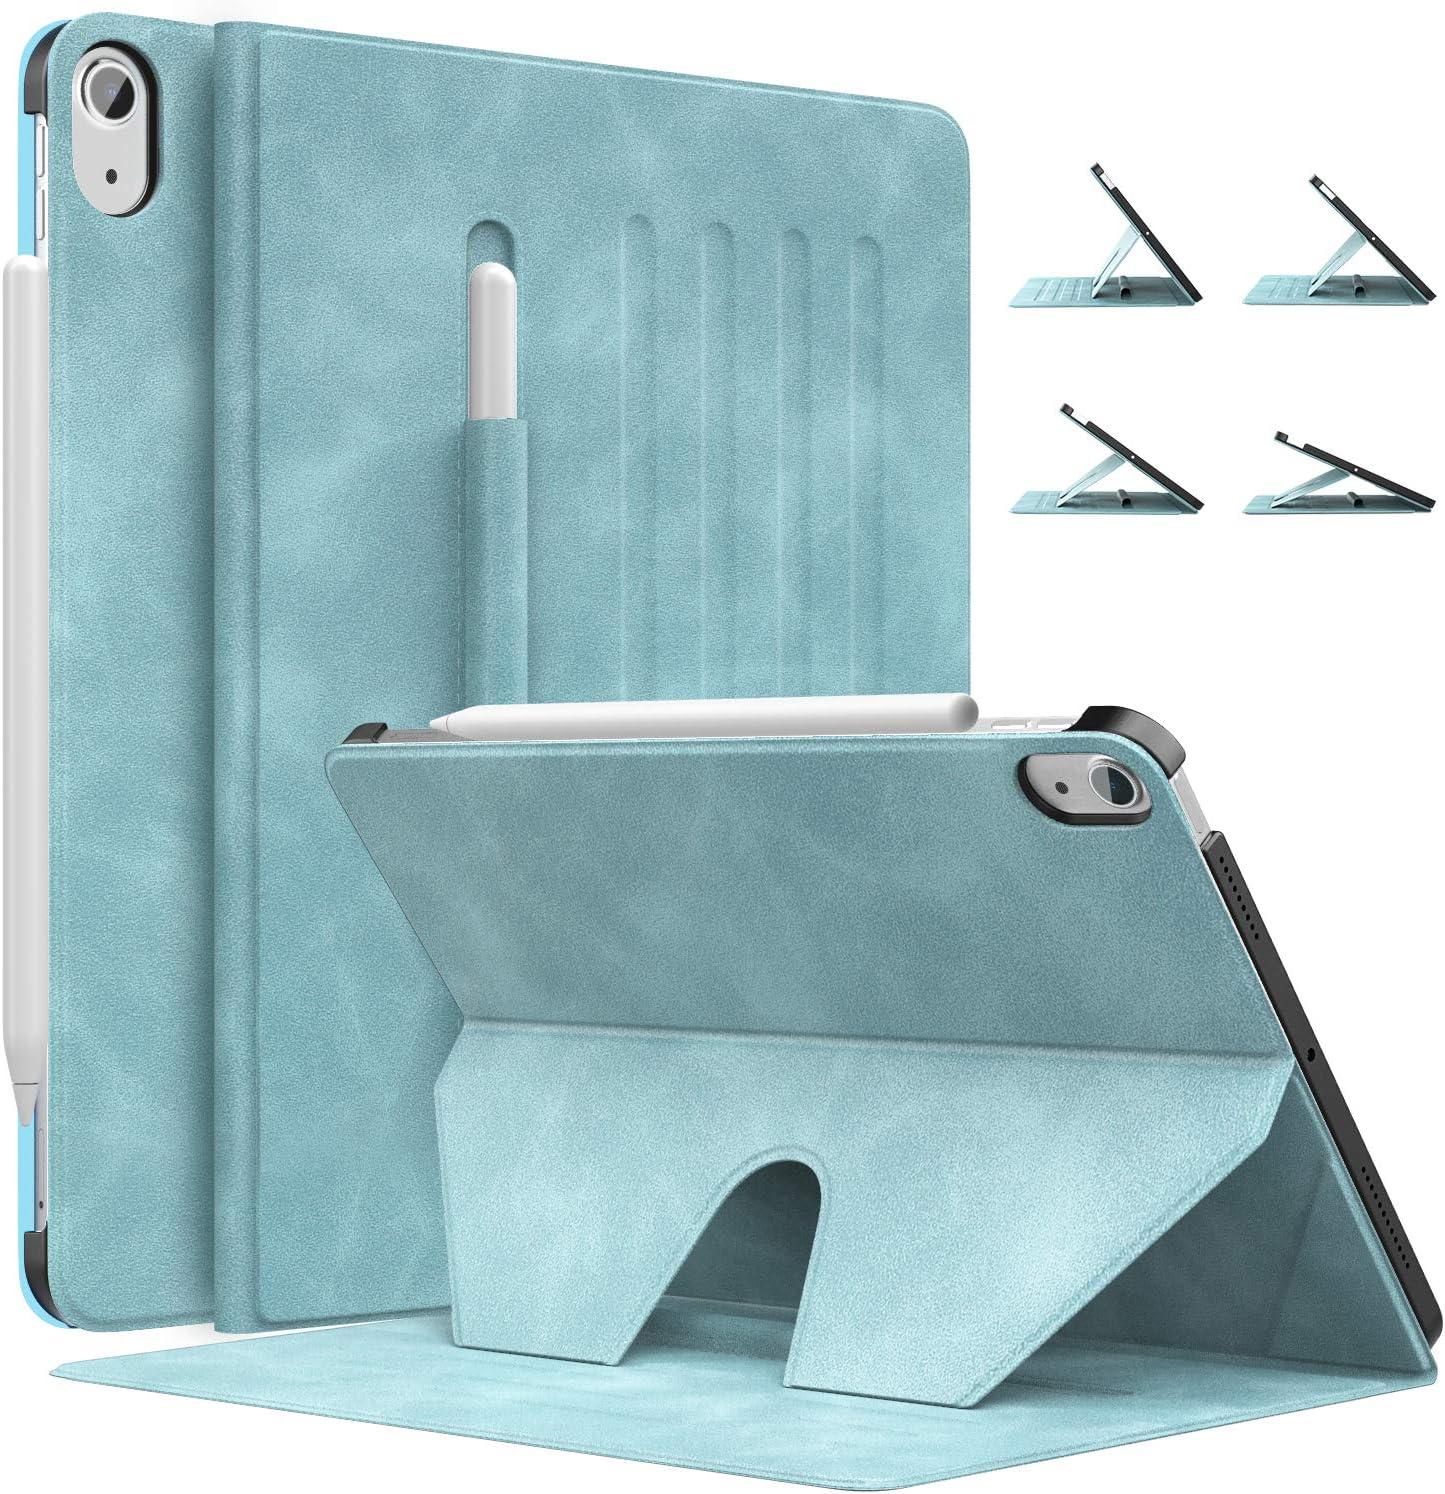 Moko Case Compatible With Ipad Air 4th Generation 2020 Elektronik